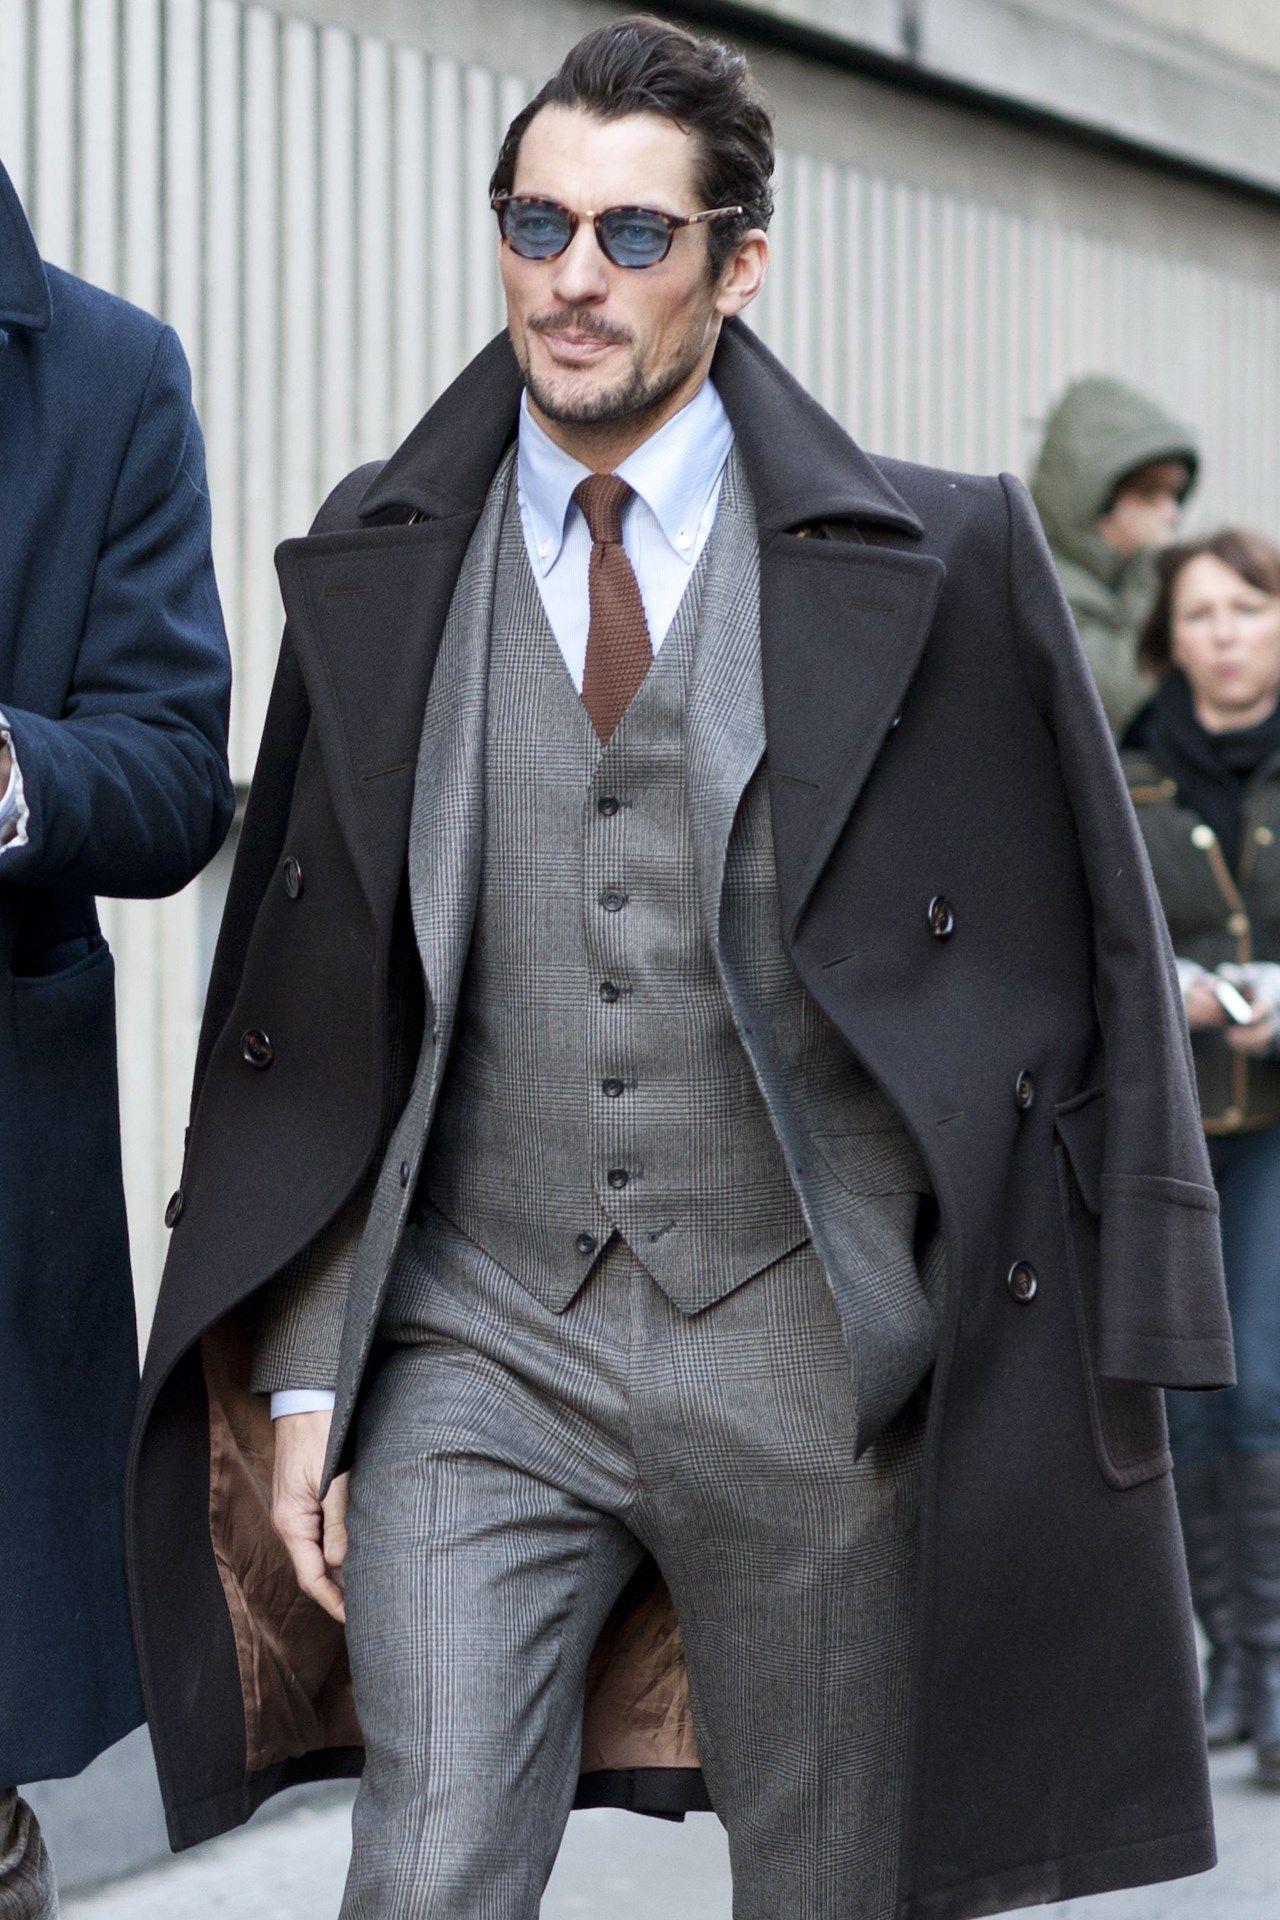 5 ways to dress like David Gandy – MEN'S FASHİON